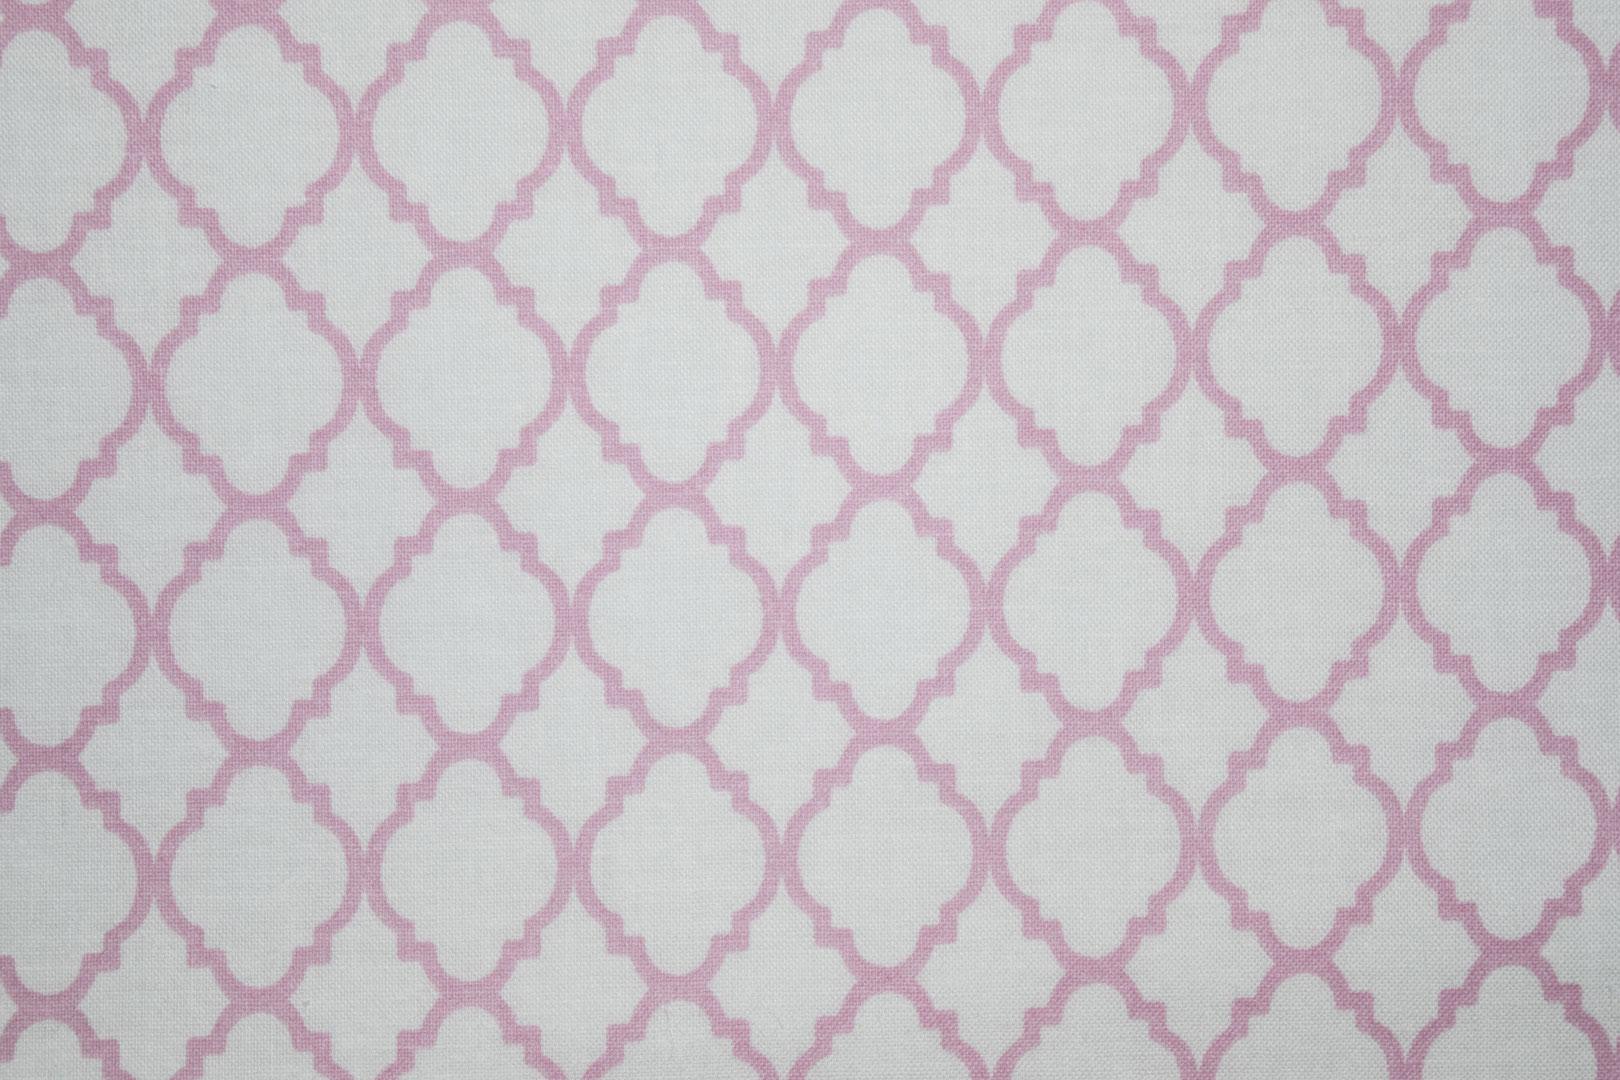 200_48974_pink